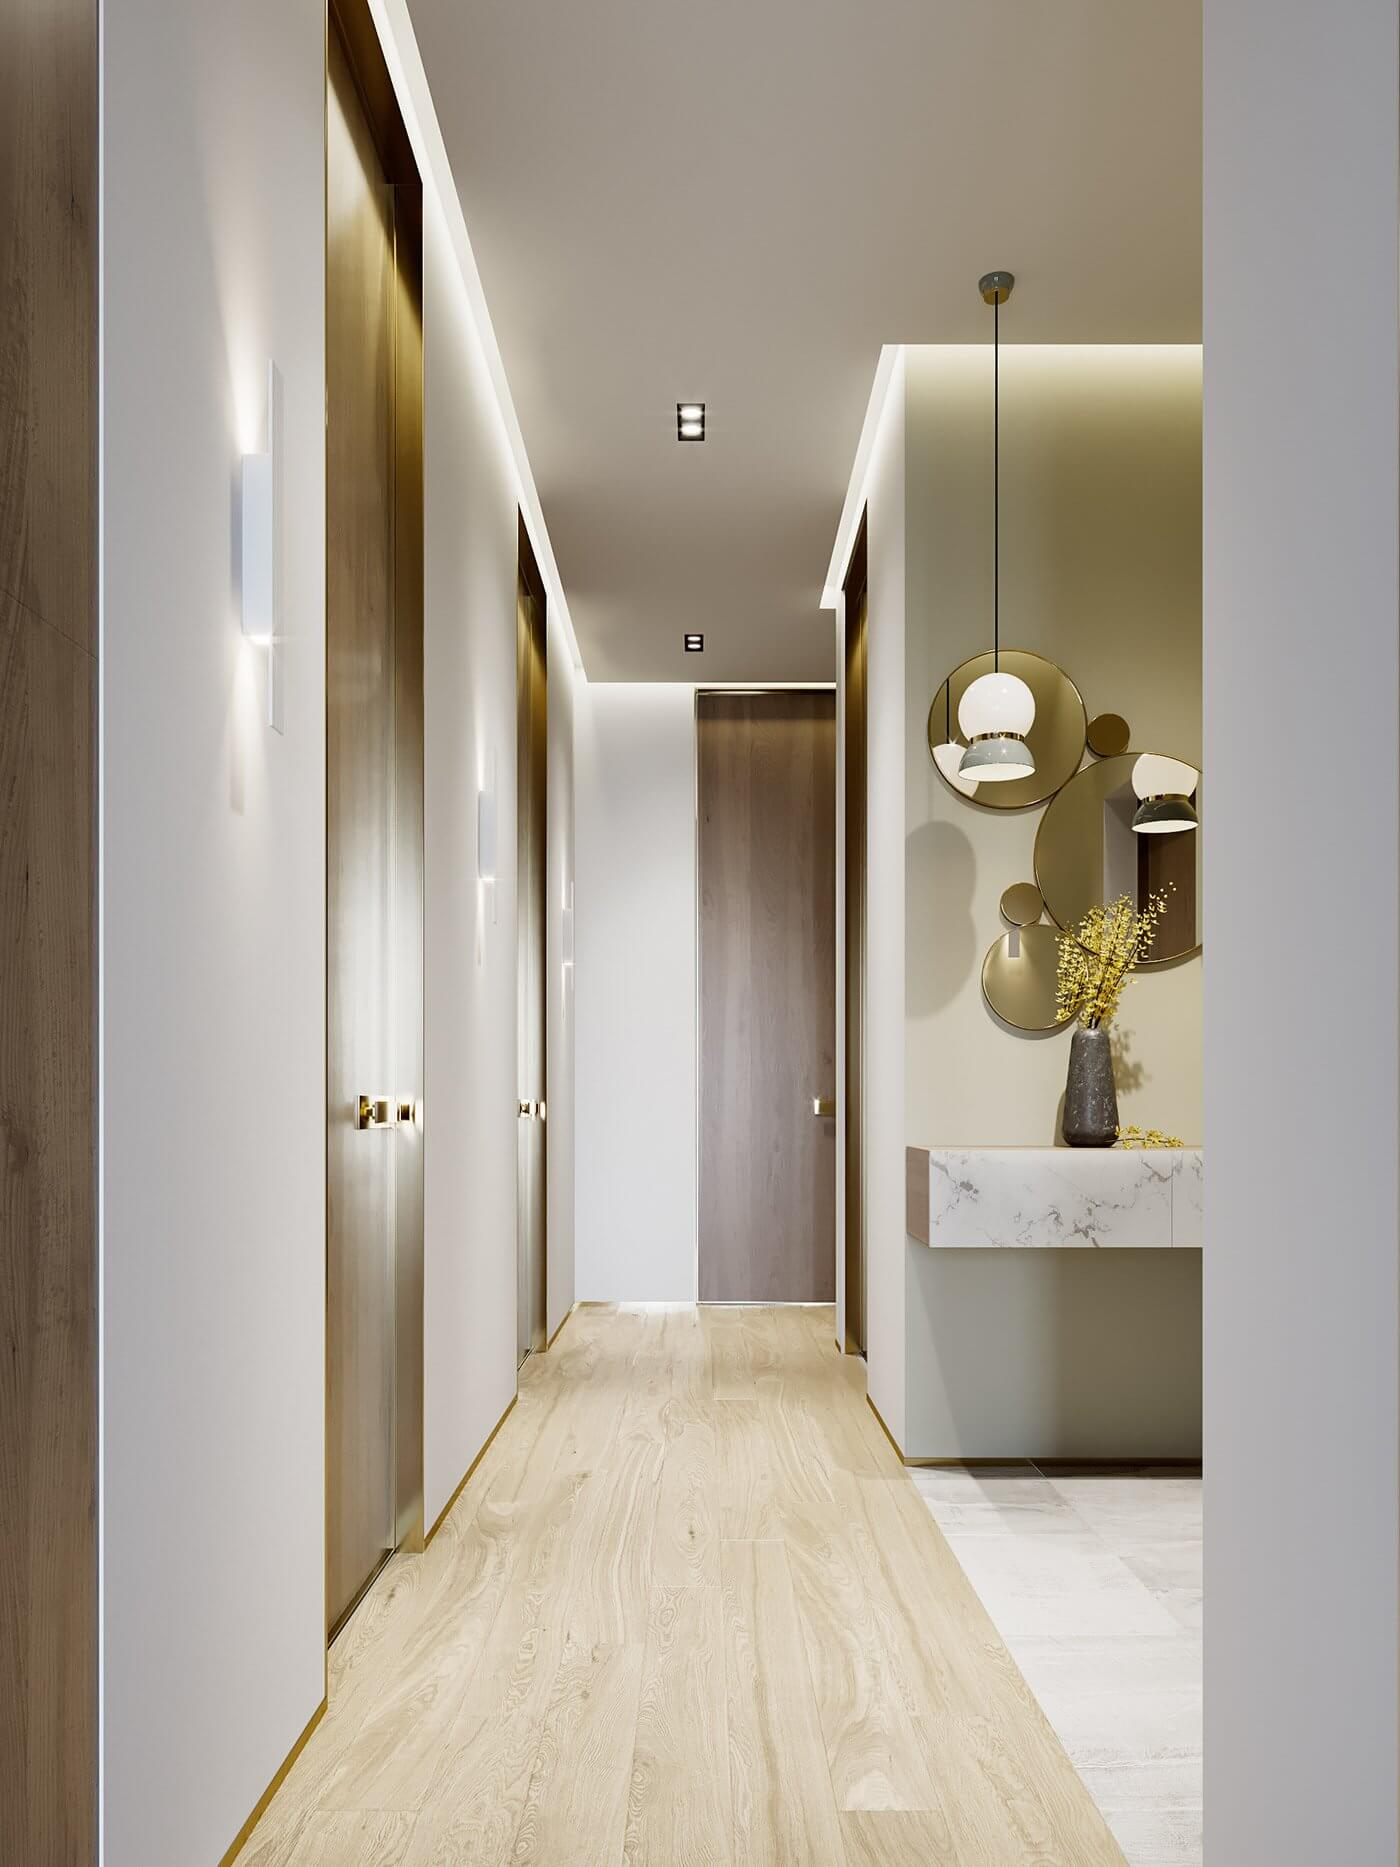 Green gold Apartment entrance corridor - cgi visualization